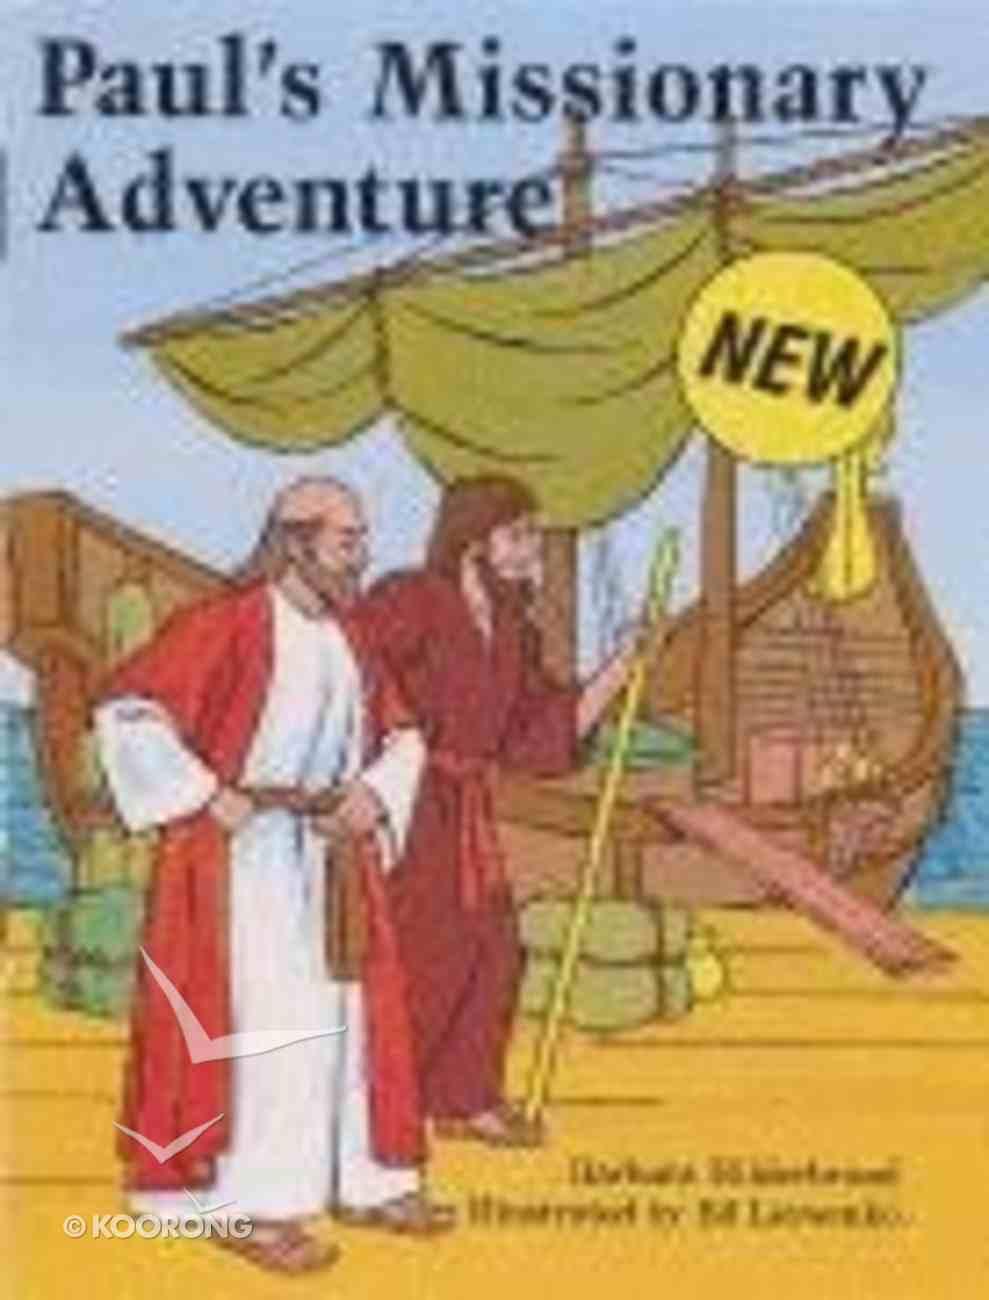 Paul's Missionary Adventure (Pencil Fun Books Series) Paperback